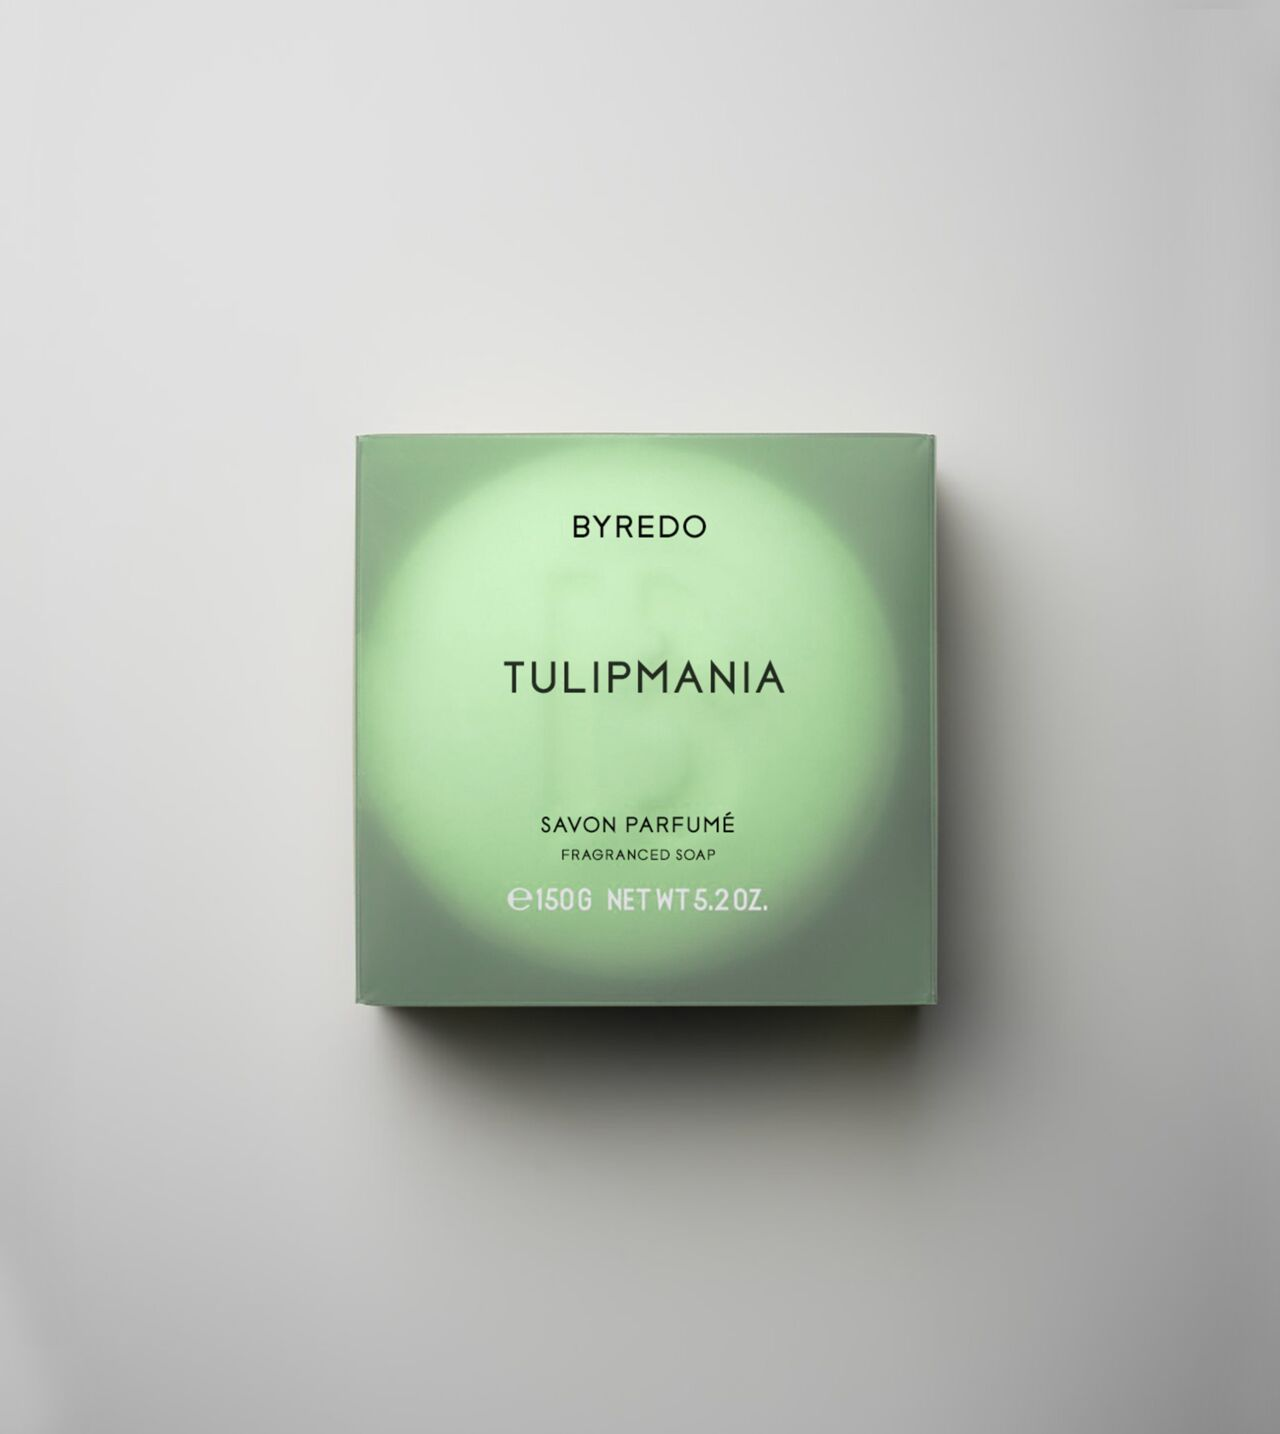 Picture of Byredo Tulipmania Hand soap